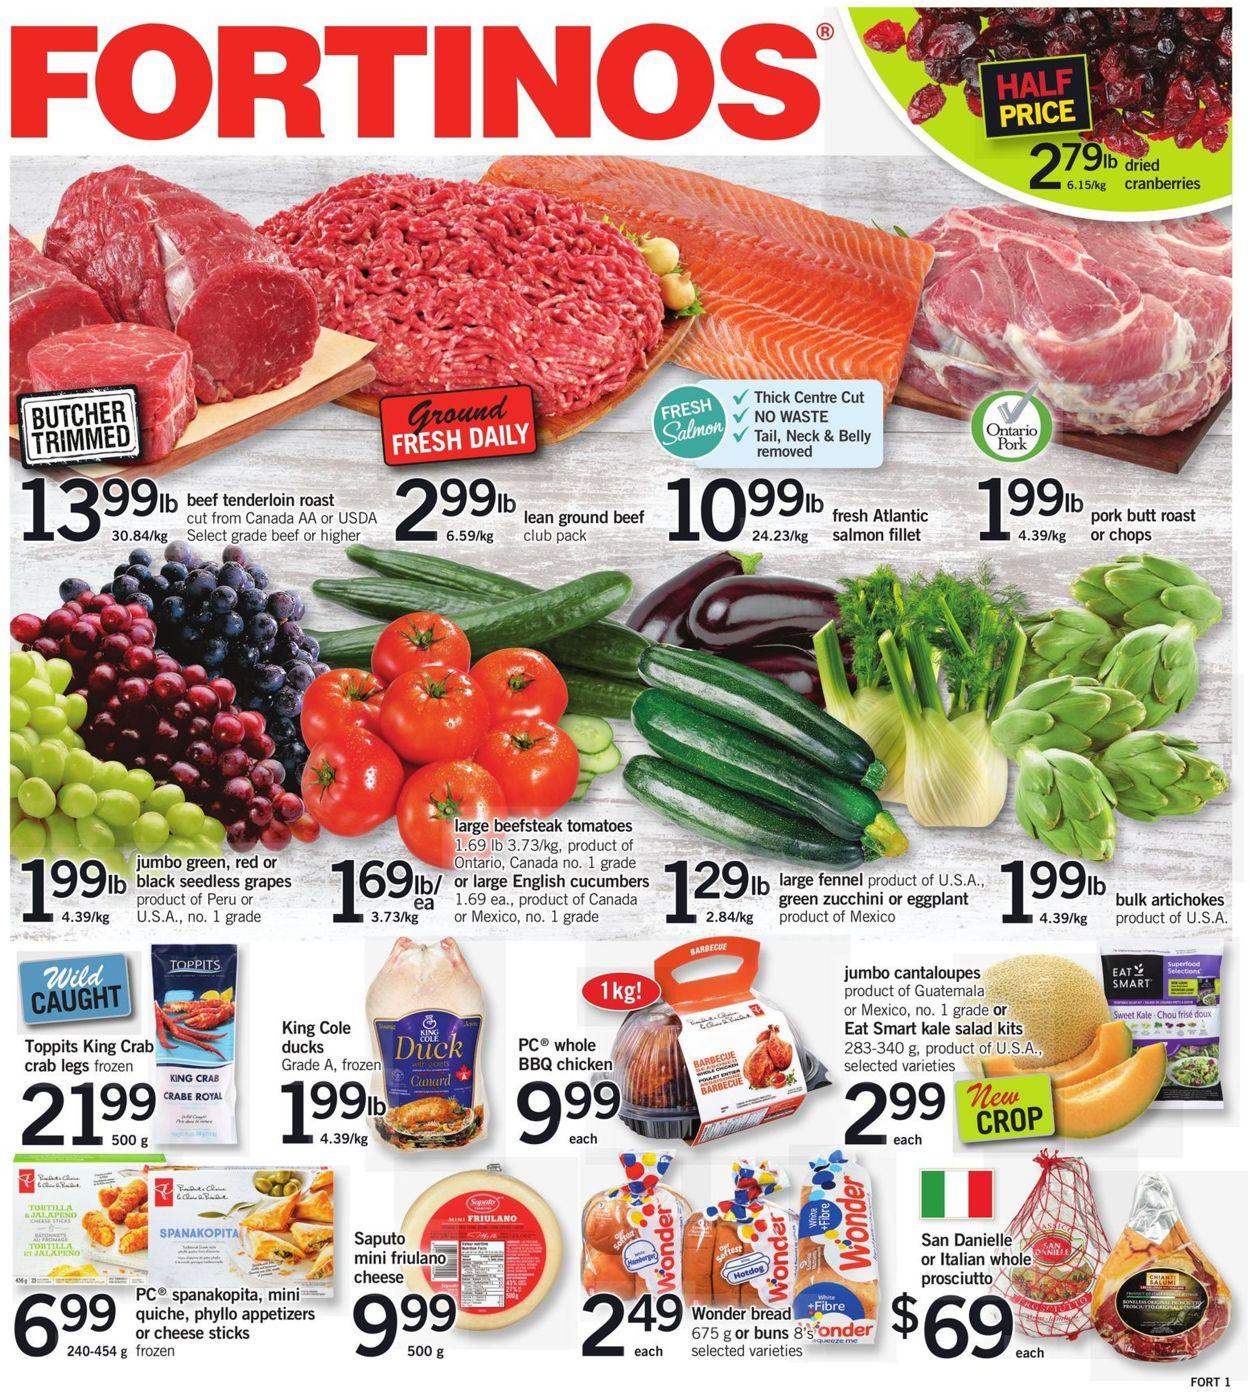 Fortinos - Black Friday 2020 Flyer - 11/26-12/02/2020